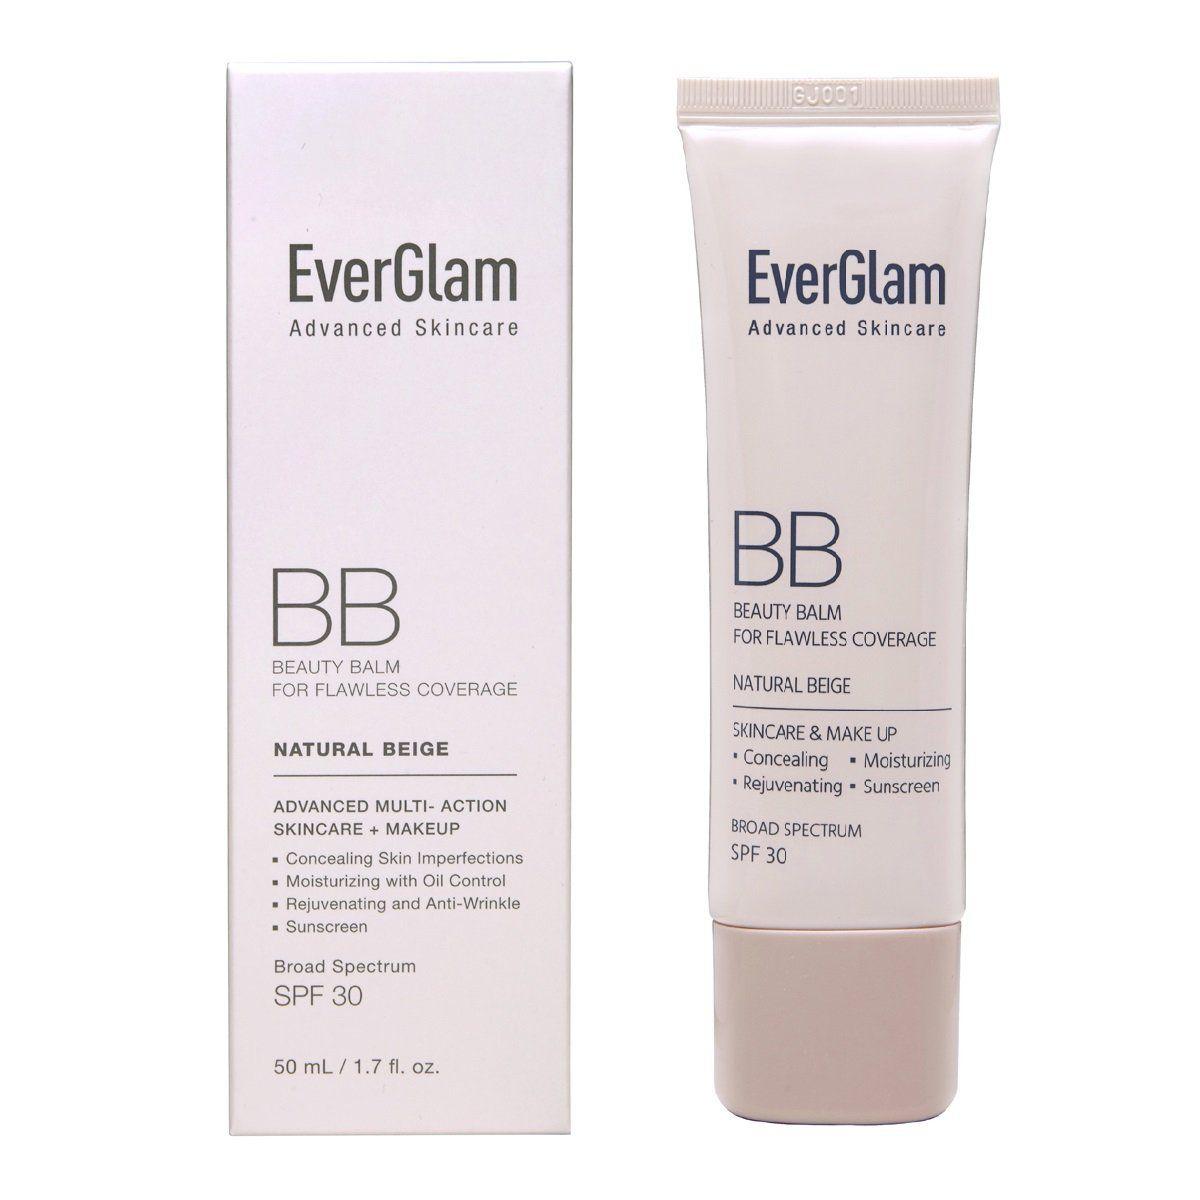 EverGlam K-Beauty Skin Perfector Korean BB Cream